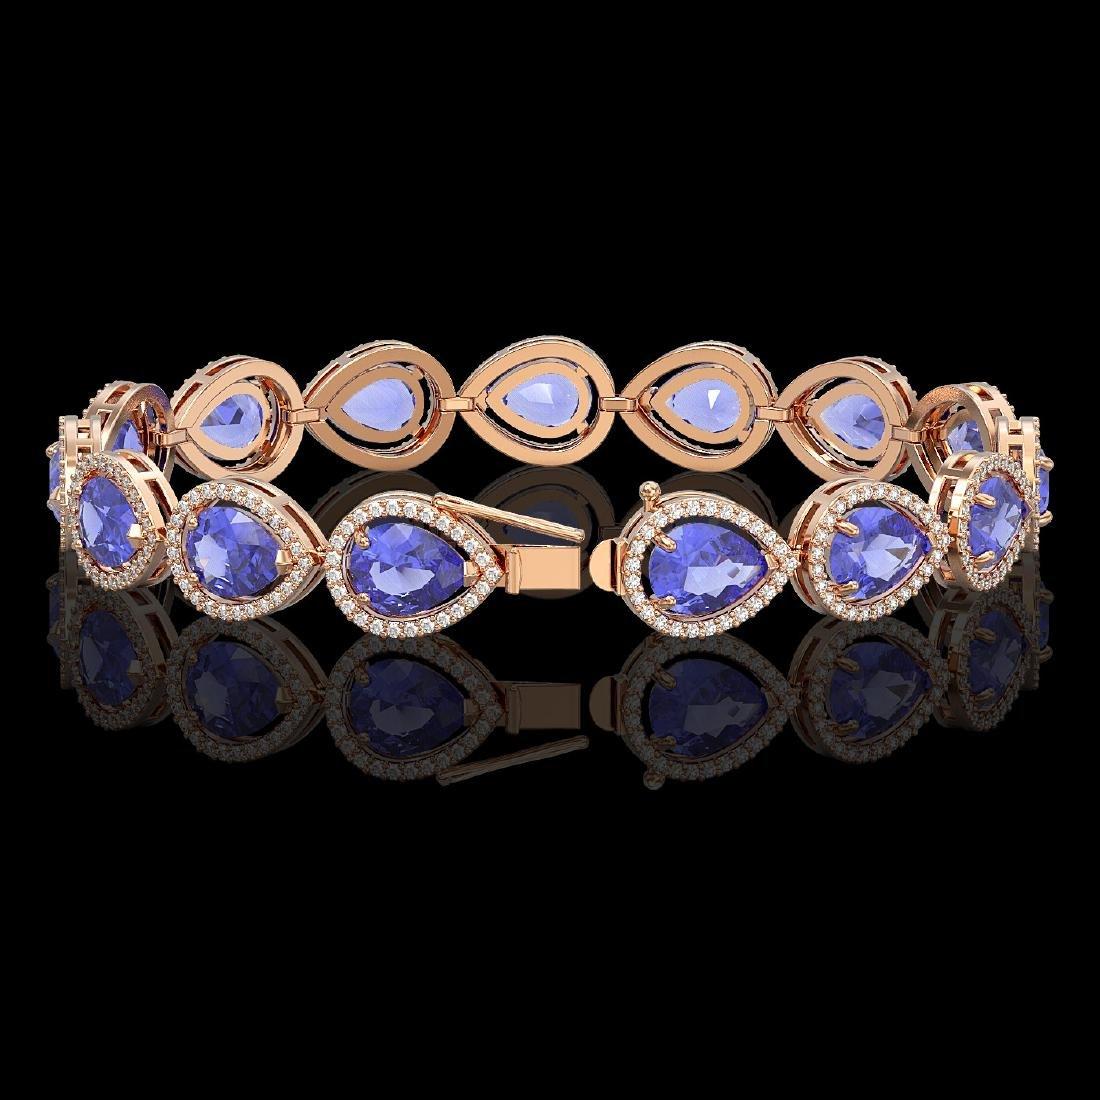 21.06 CTW Tanzanite & Diamond Halo Bracelet 10K Rose - 2